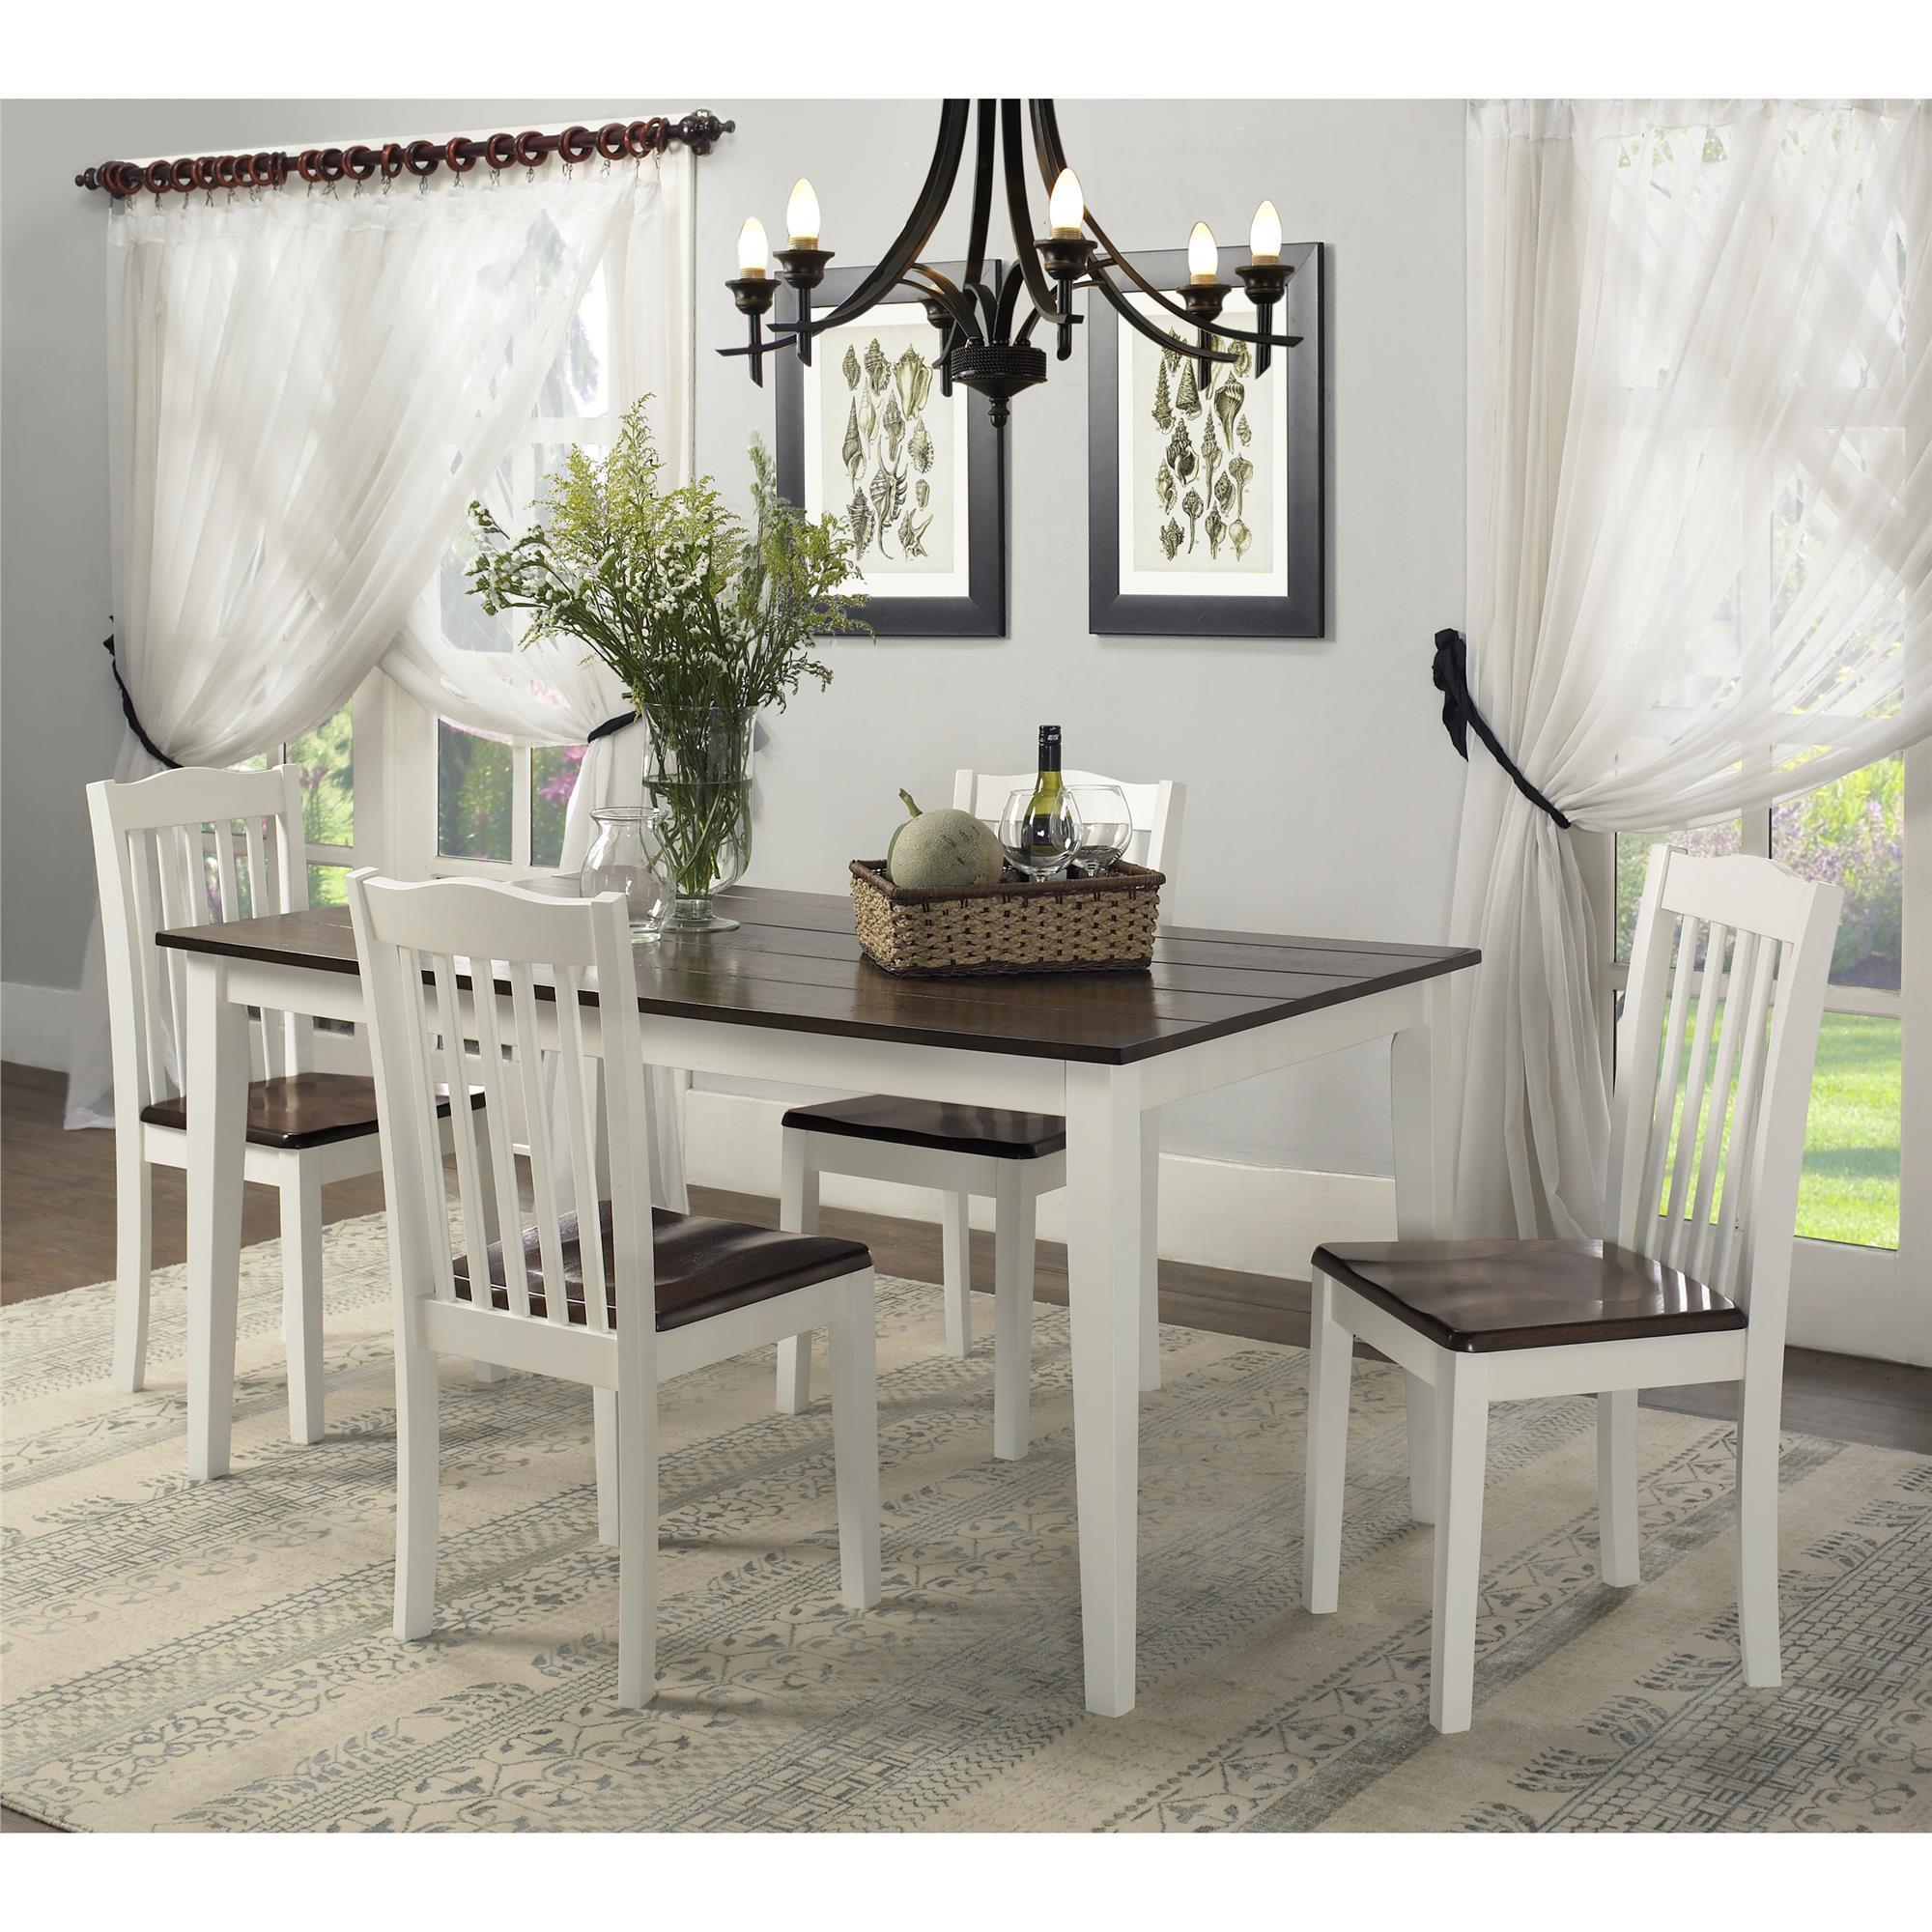 Shop dorel living shiloh 5 piece rustic dining set free shipping today overstock com 20187062